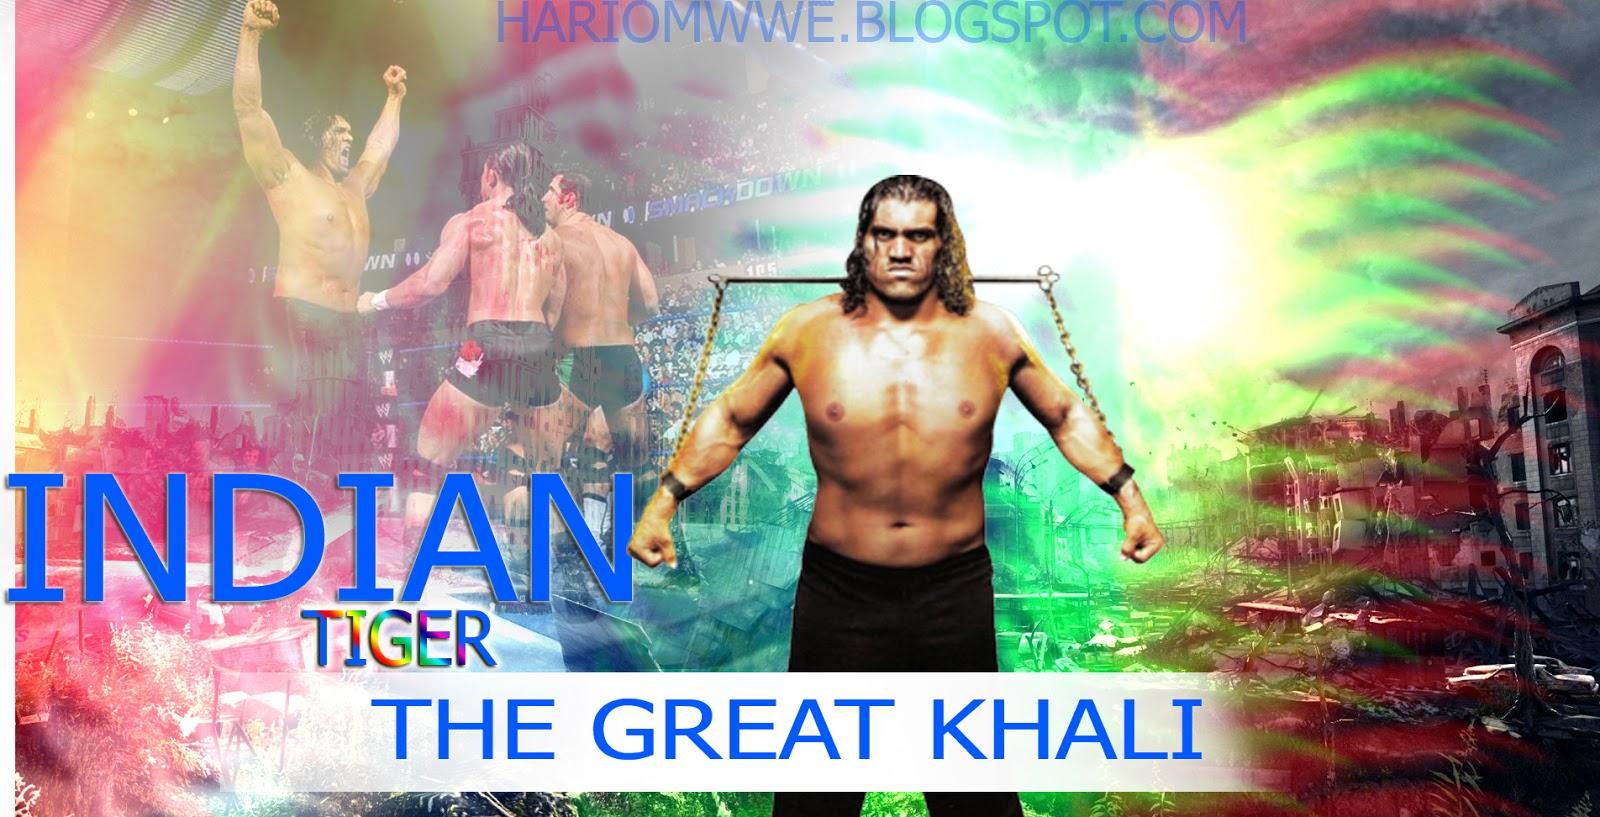 Wwe Superstars 2013 Wallpaper The Great Khali Hq Wallpaper